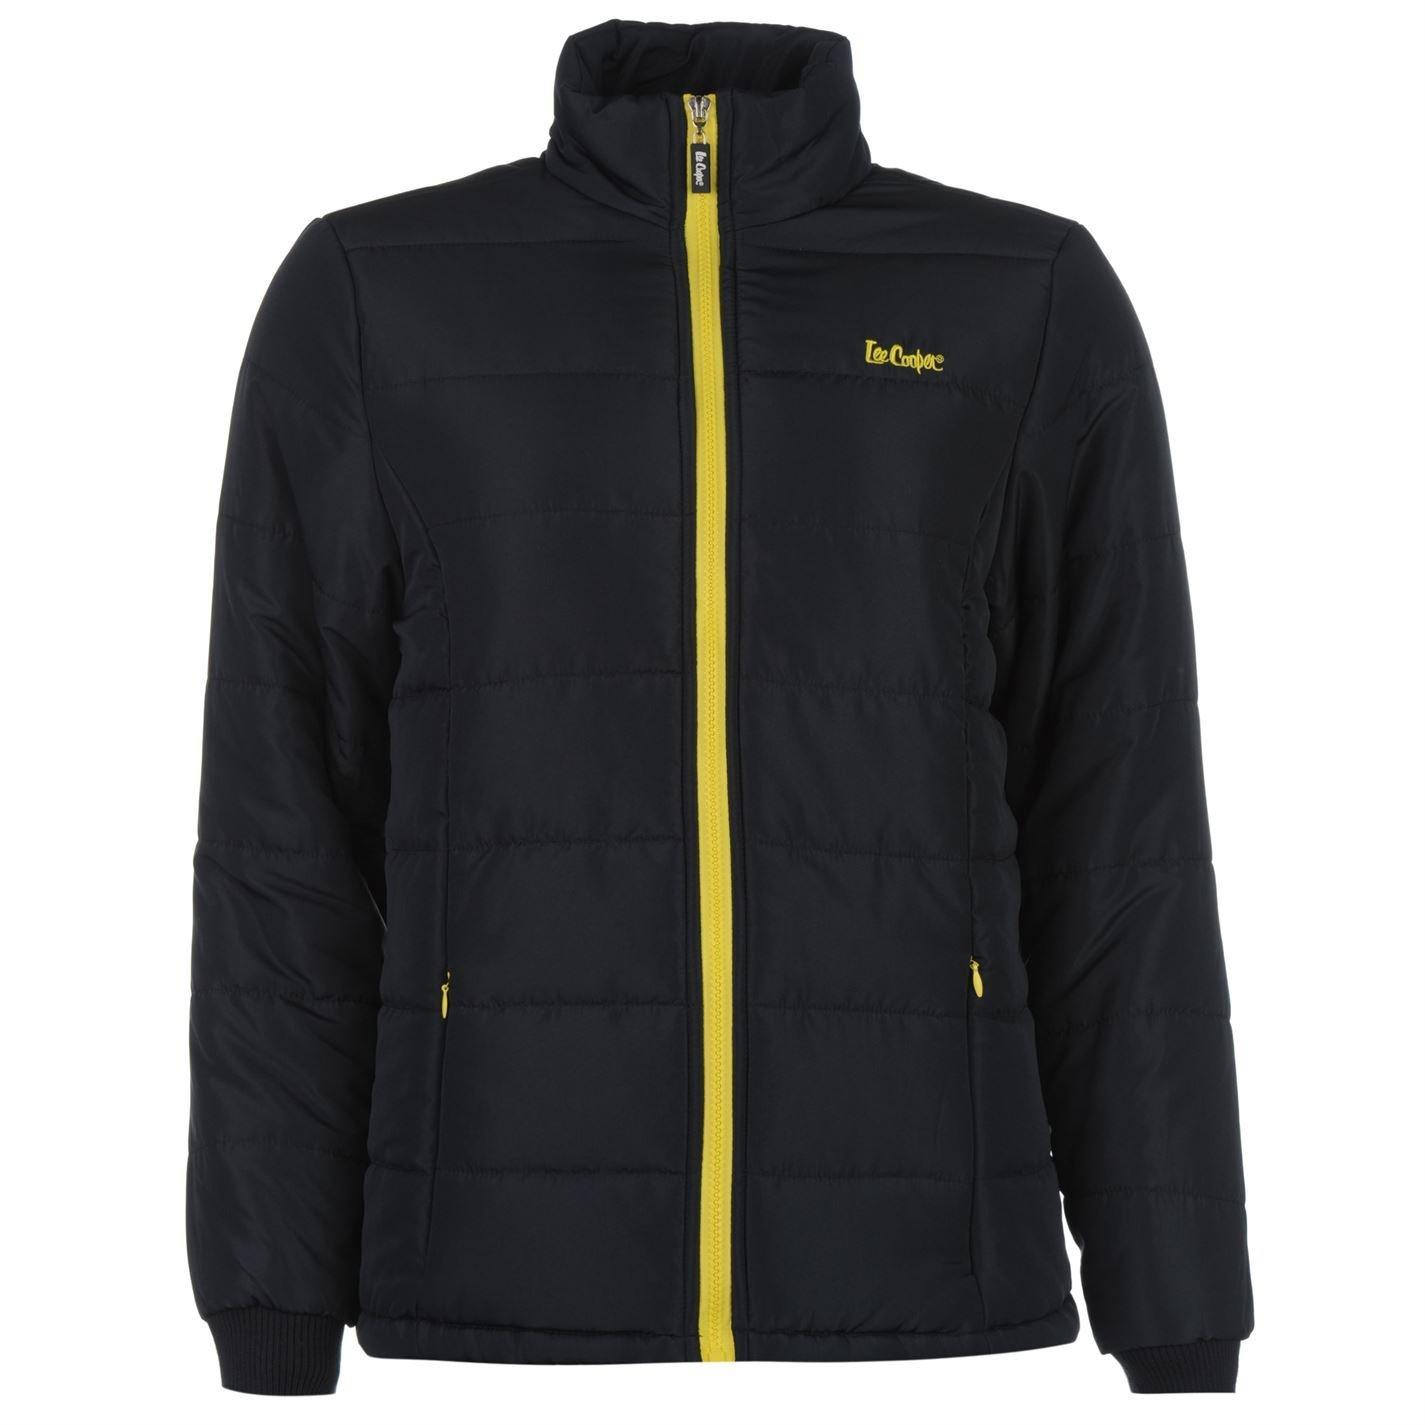 Lee Cooper acolchado chaqueta para mujer azul marino/amarillo chaquetas y abrigos de ropa abrigo, Na...